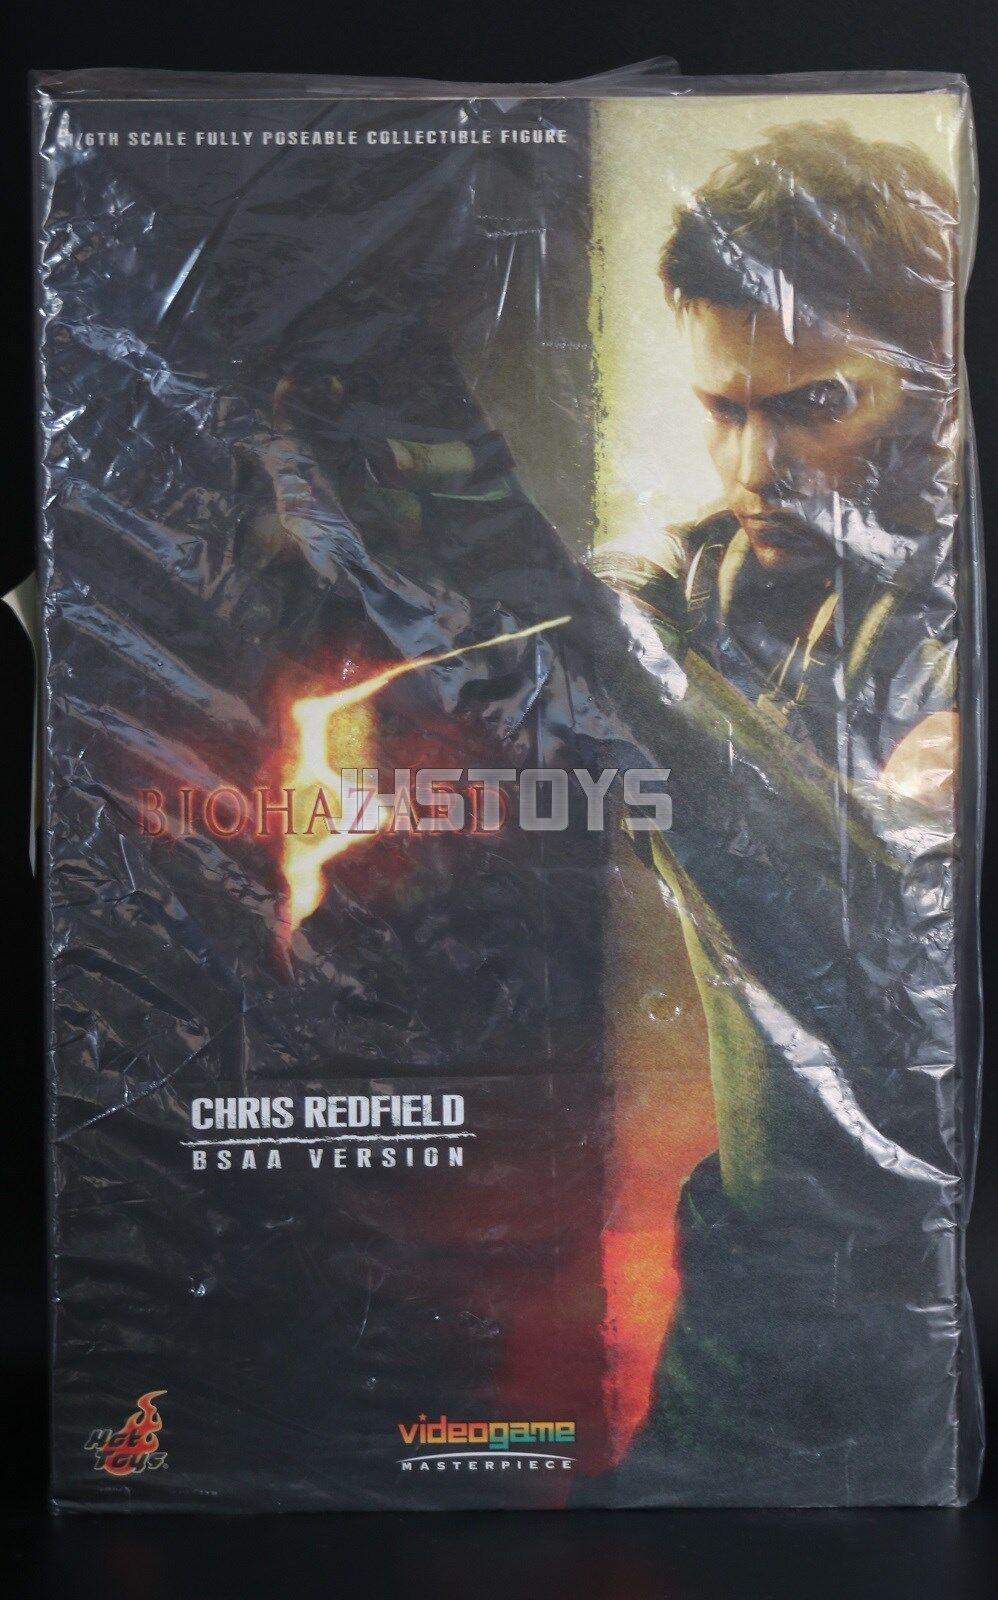 Hot Toys 1/6 Resident Evil Biohazard 5 Chris ROTfield BSAA Version VGM06